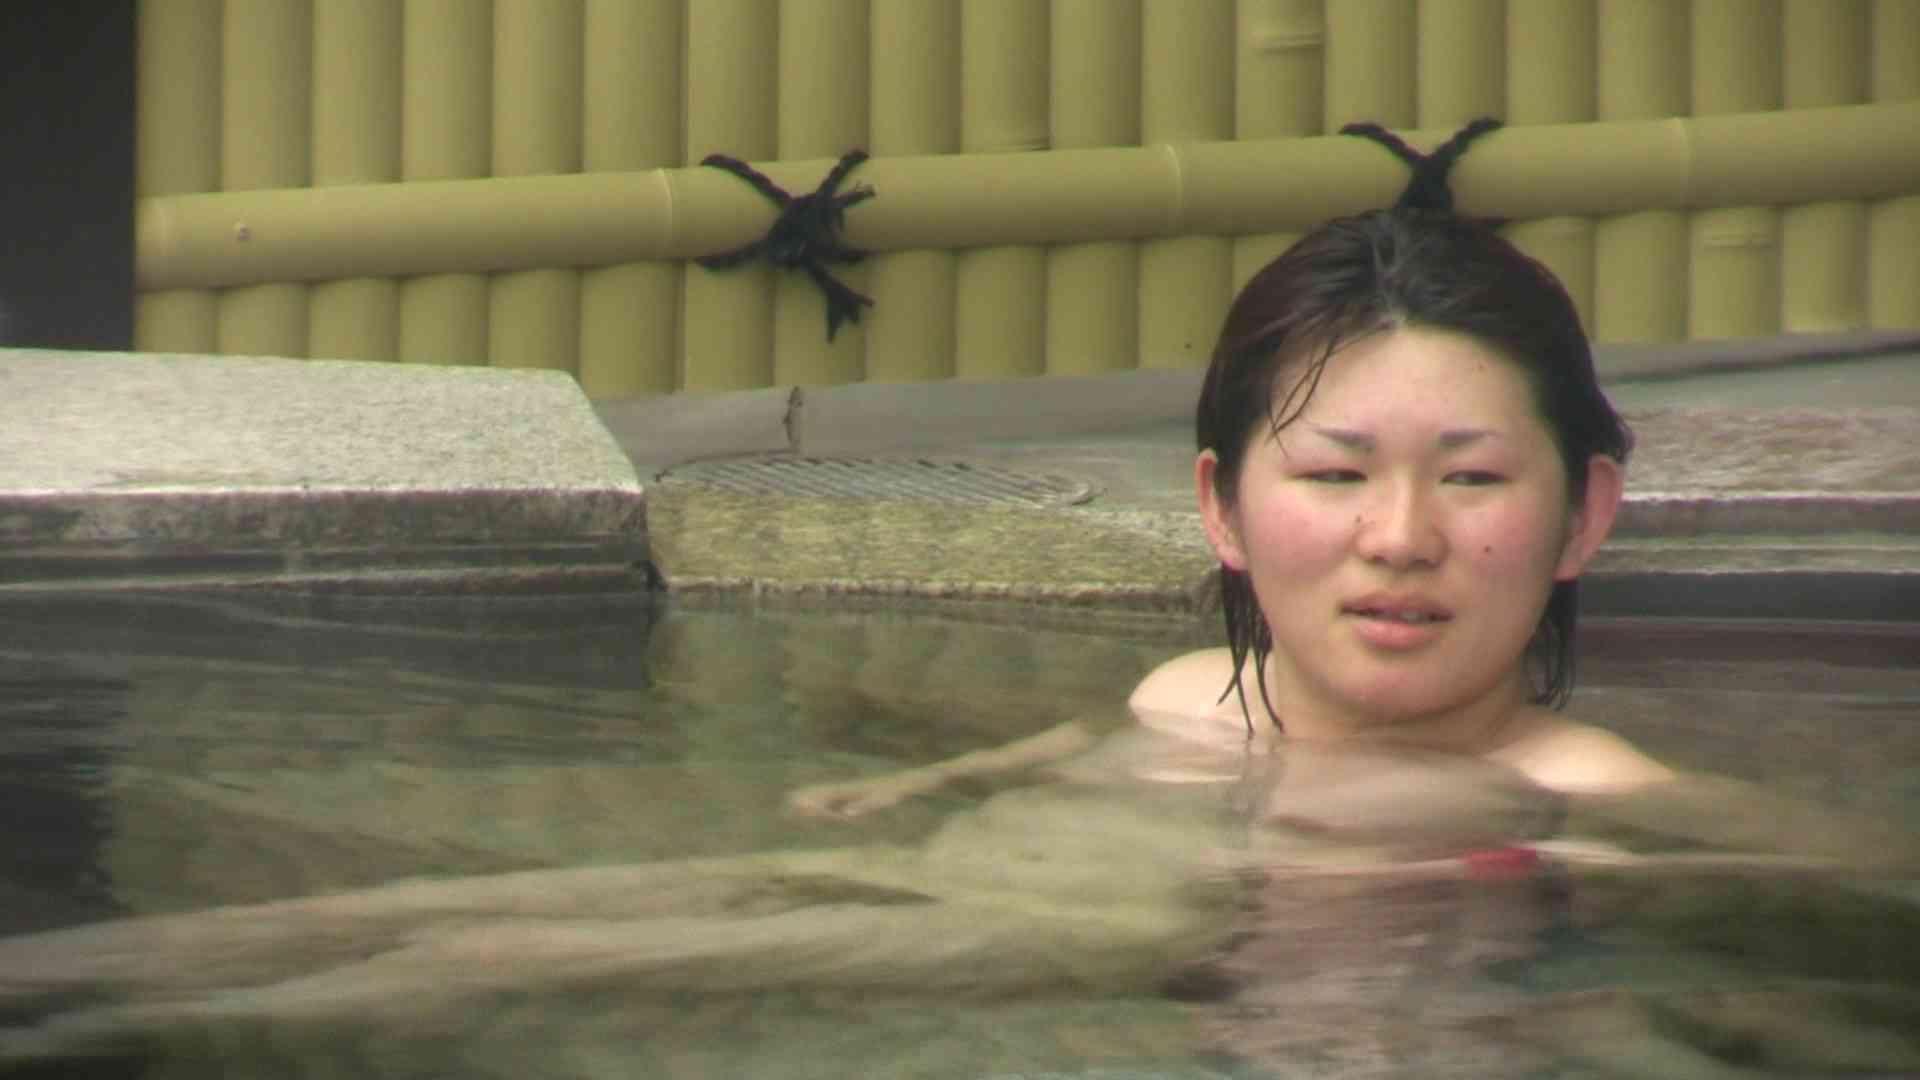 Aquaな露天風呂Vol.673 盗撮 おめこ無修正画像 45連発 38